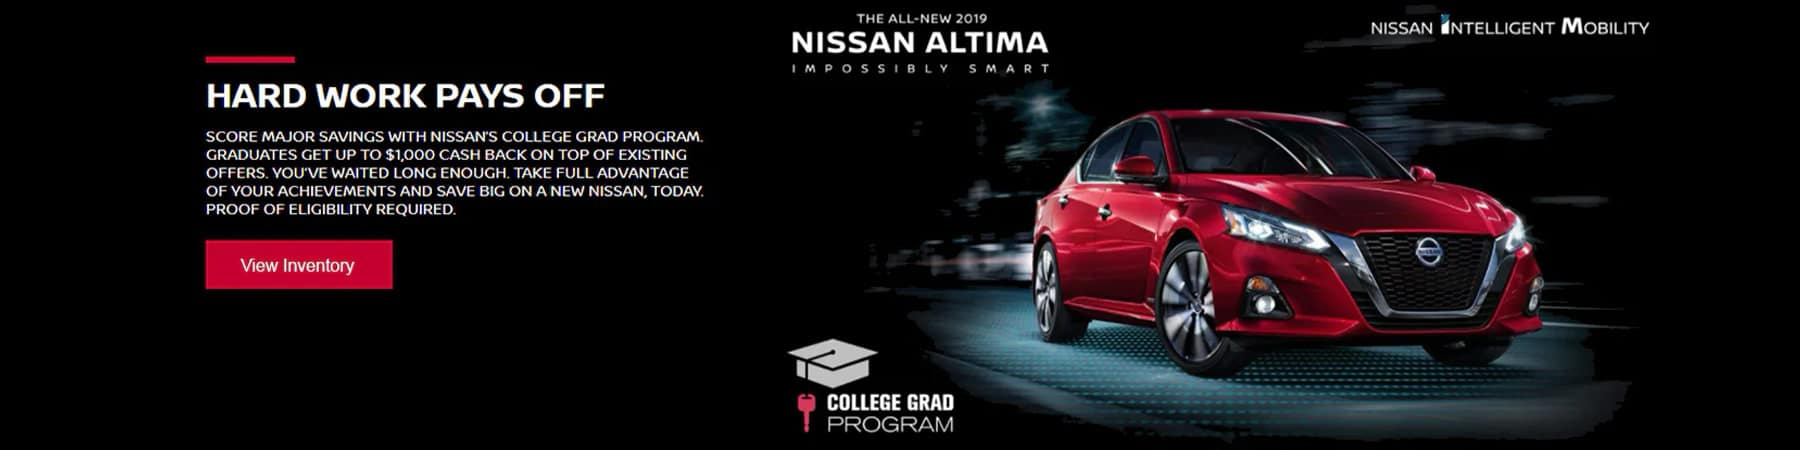 Nissan-College-Grad